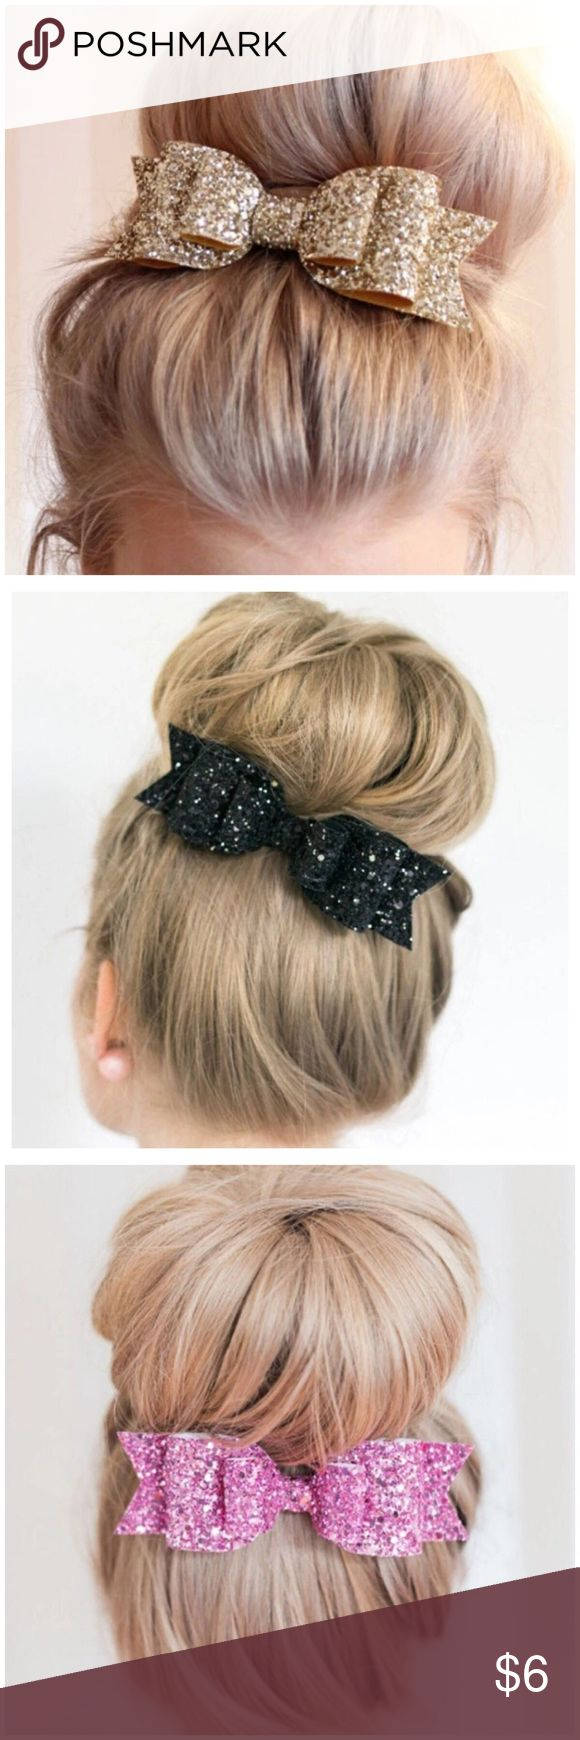 "HP Glitter Fabric Bow Hair Barrette Glitter Fabric Bow Hair Barrette --- French Barrette back --- price is per barrette --- 4.5"" x 1.5"" Boutique Accessories Hair Accessories"